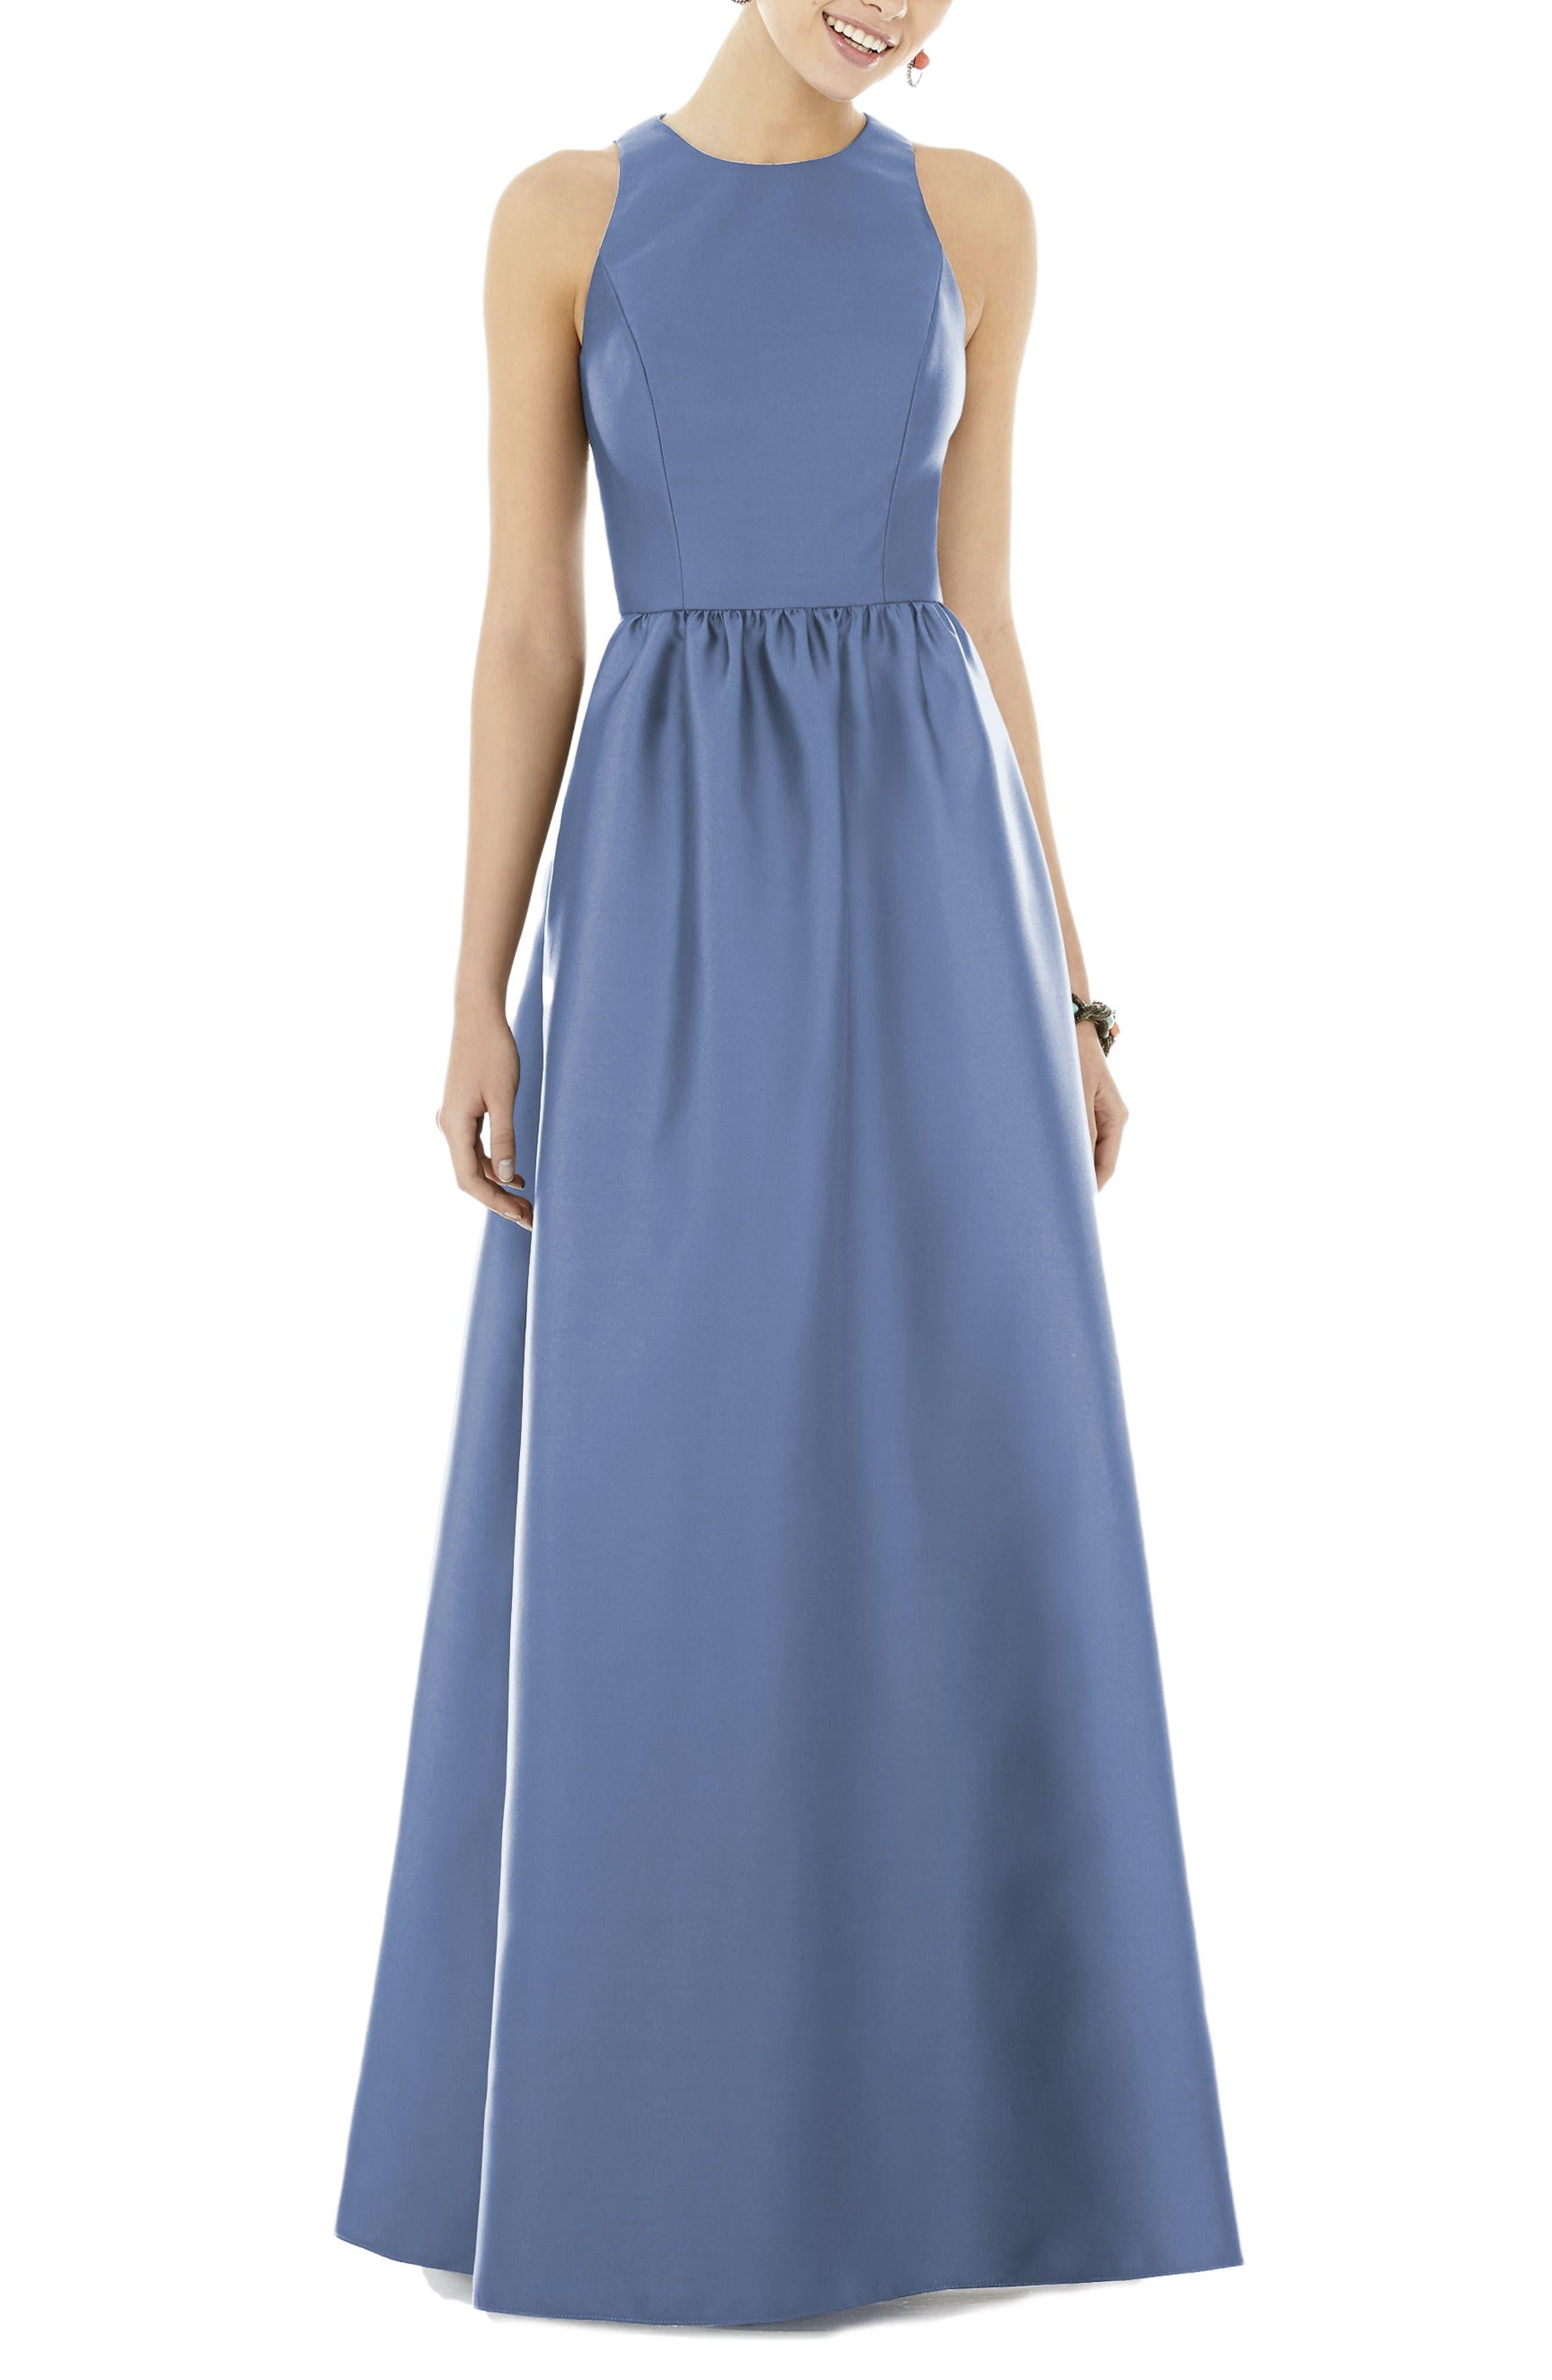 Mother-of-the-Bride Dresses | Nordstrom